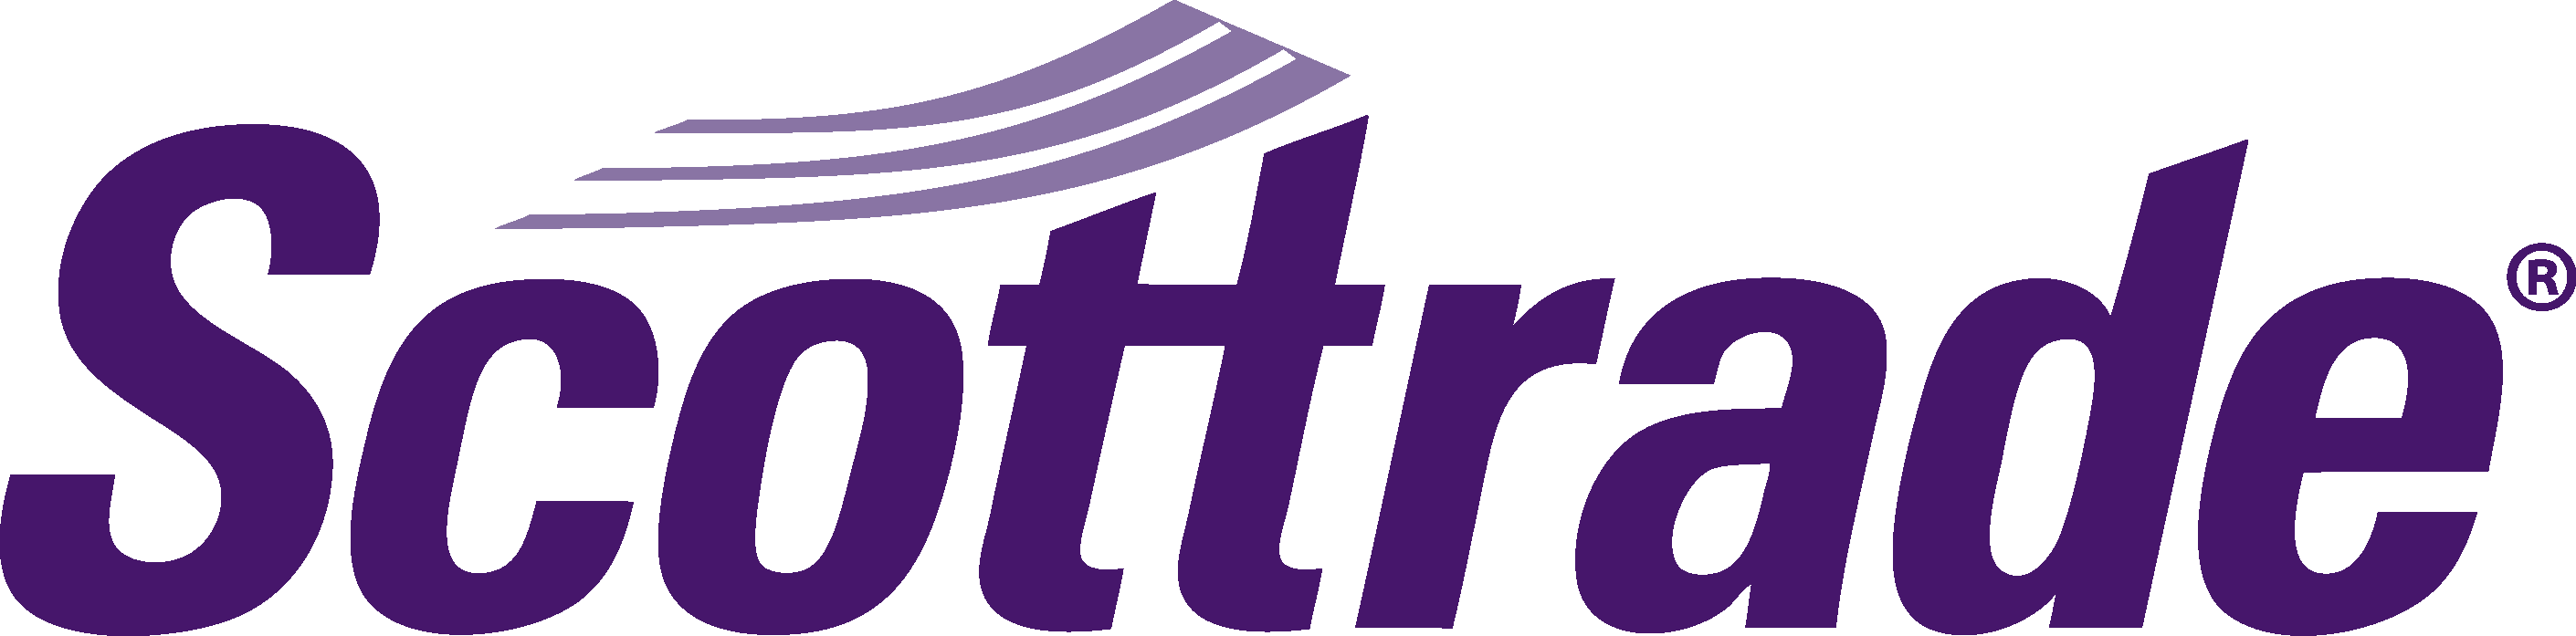 Scottrade Logo png